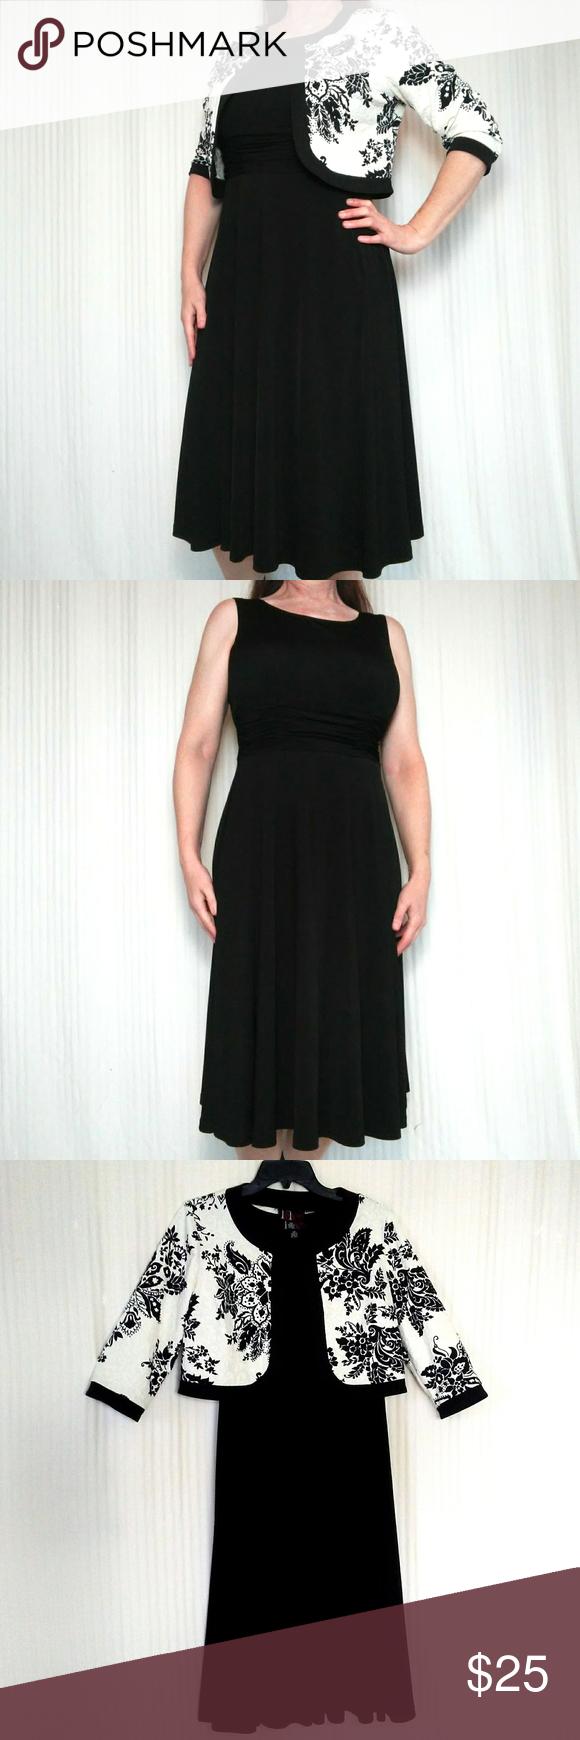 R K 2 Piece Dress Black Sleeveless Dress With Empire Waist Dress Has Some Stretch To It Can Be Worn Alone Piece Dress Clothes Design Black Sleeveless Dress [ 1740 x 580 Pixel ]